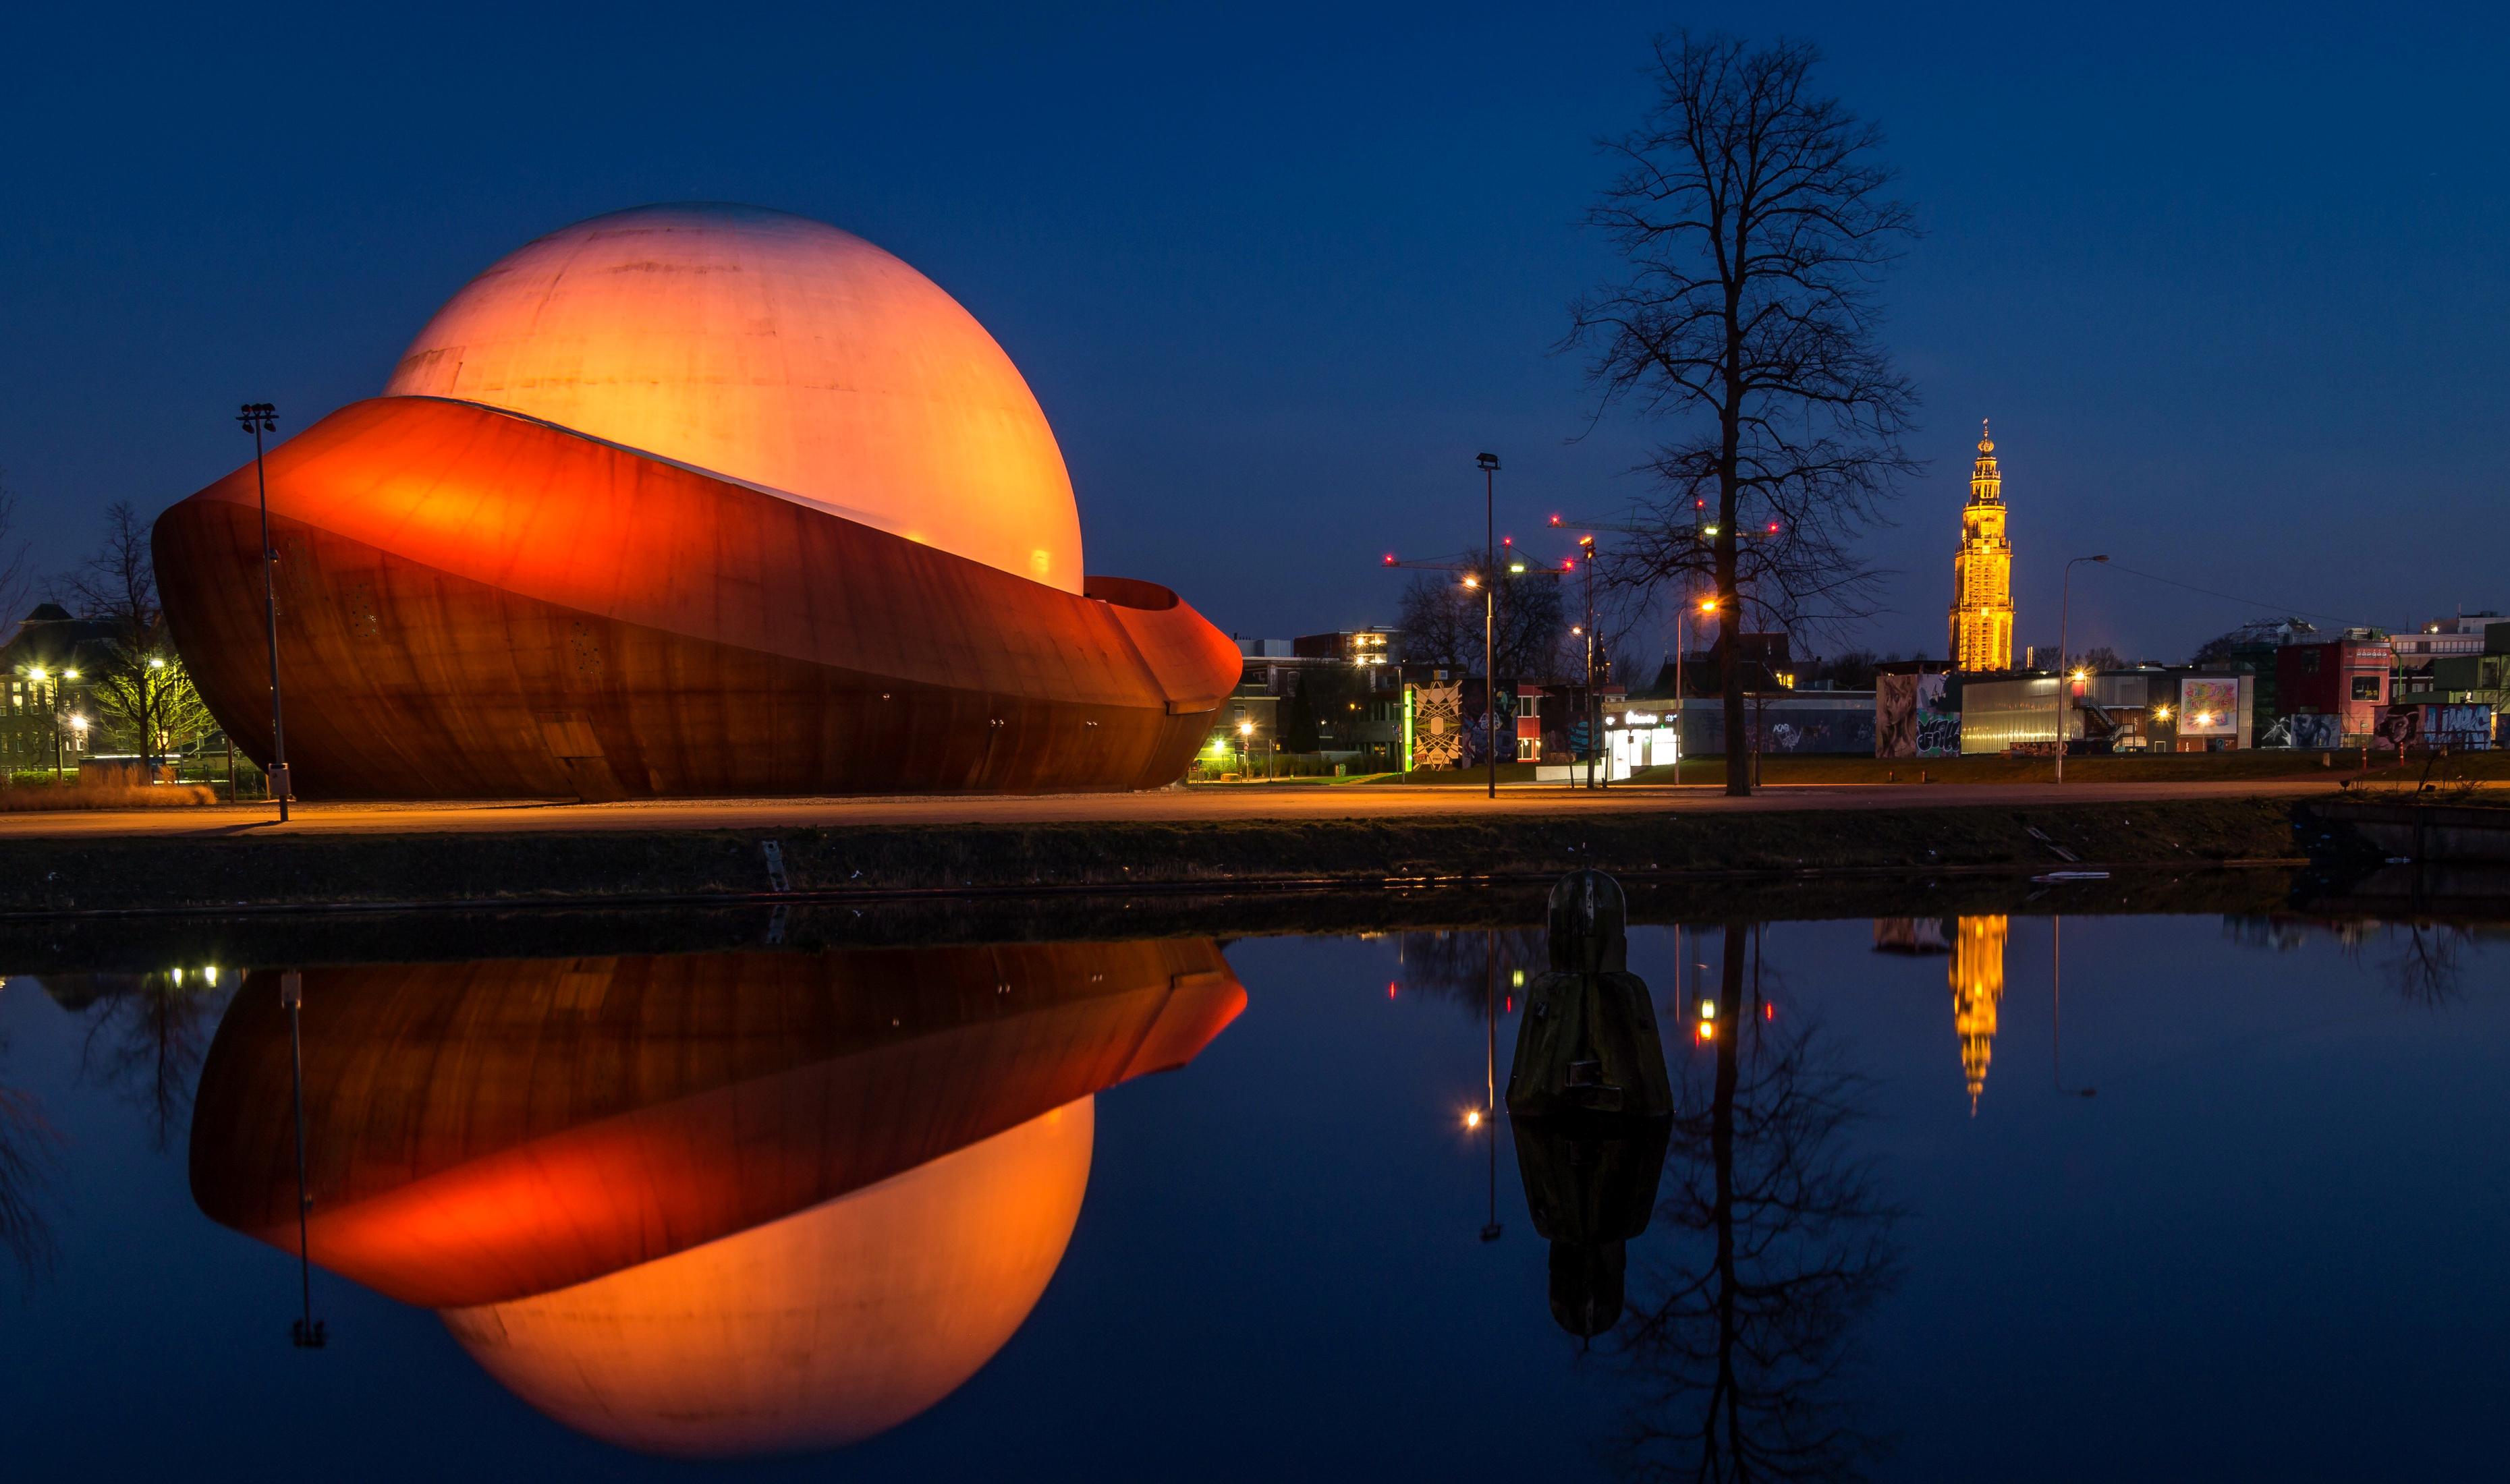 Beautiful building of a planetarium in Groningen ...